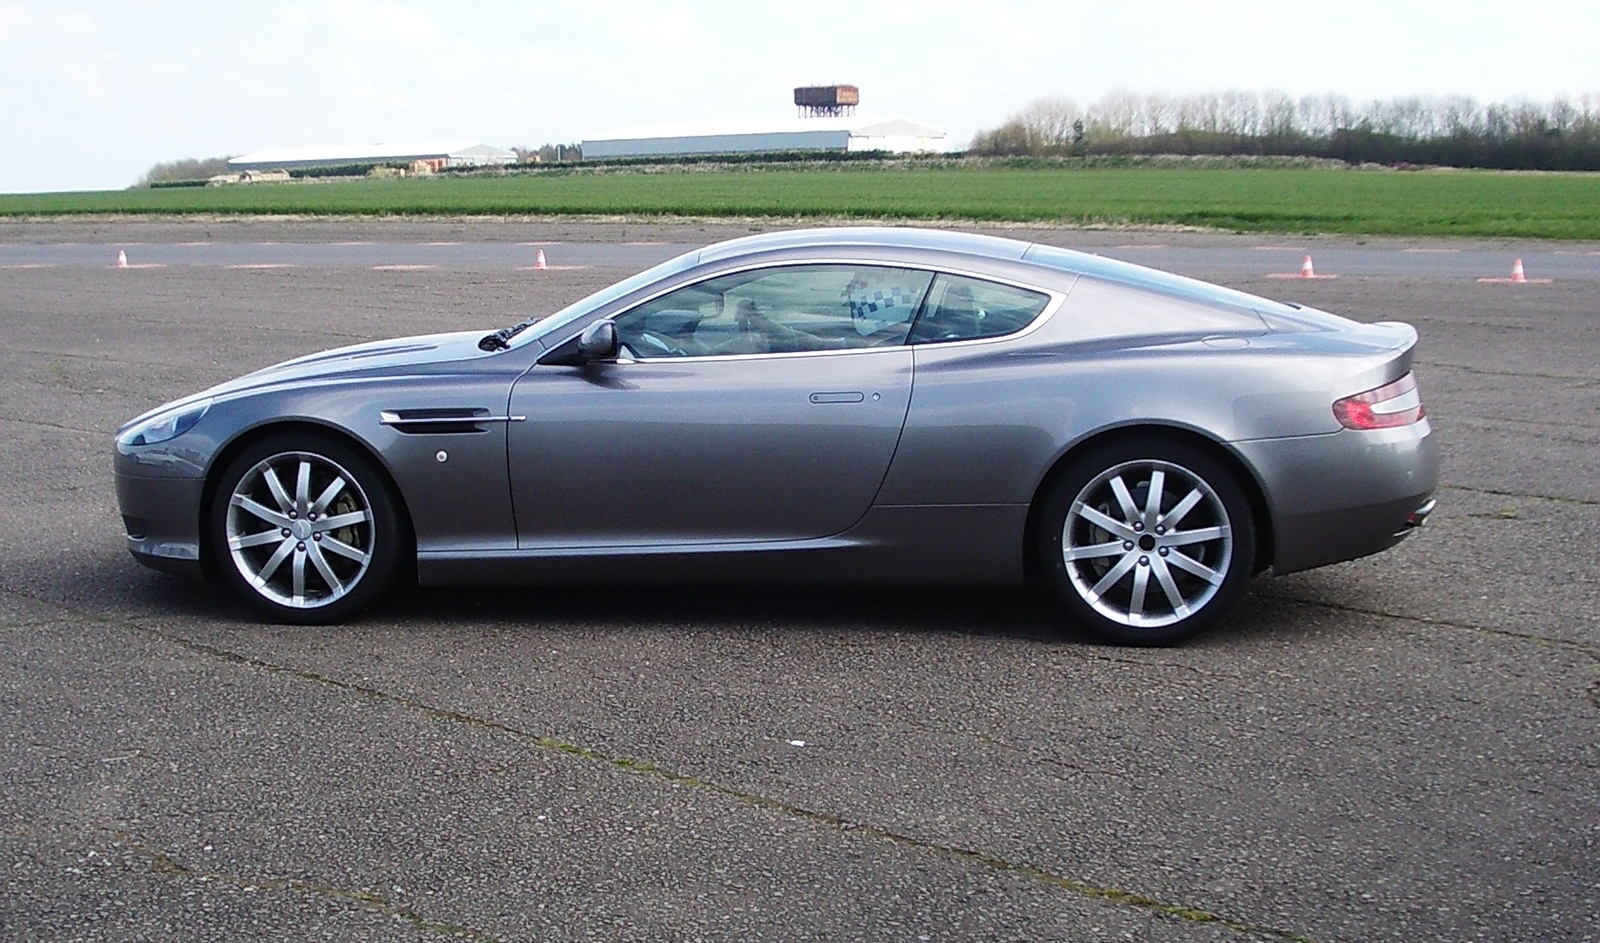 2005 Aston Martin Db9 Image 16